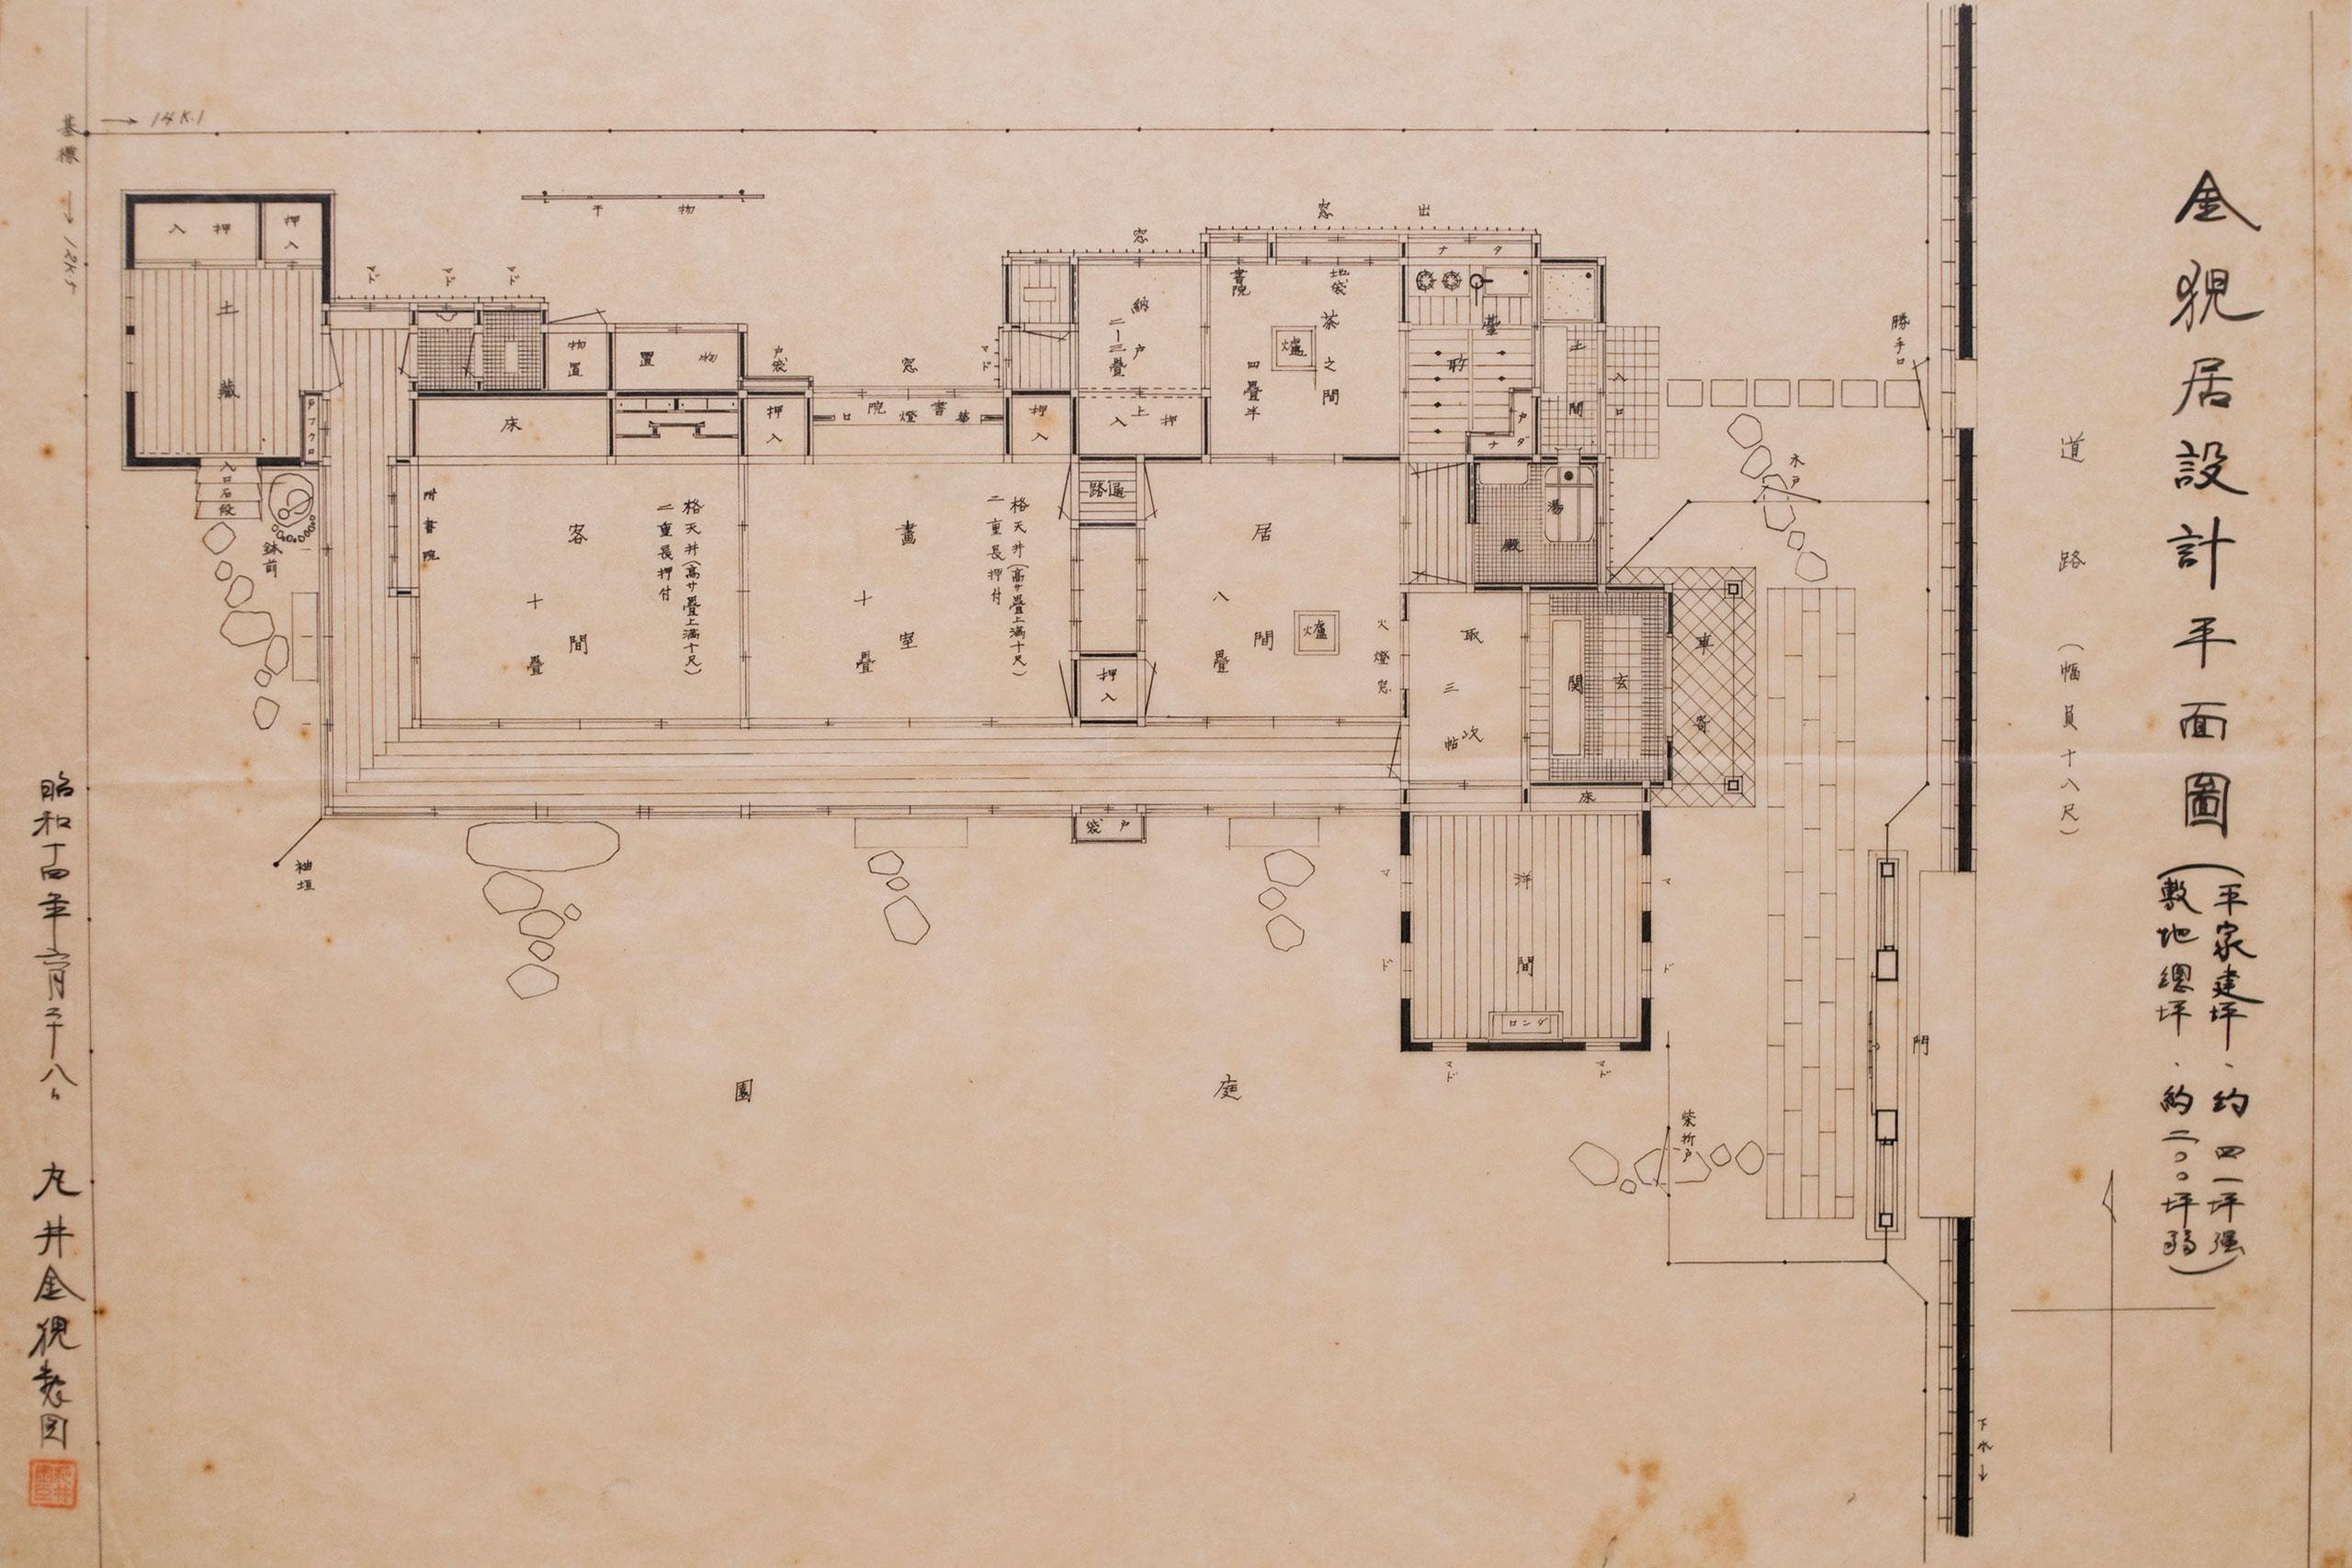 金猊居設計平面圖 - Master Plan of Kingei's House